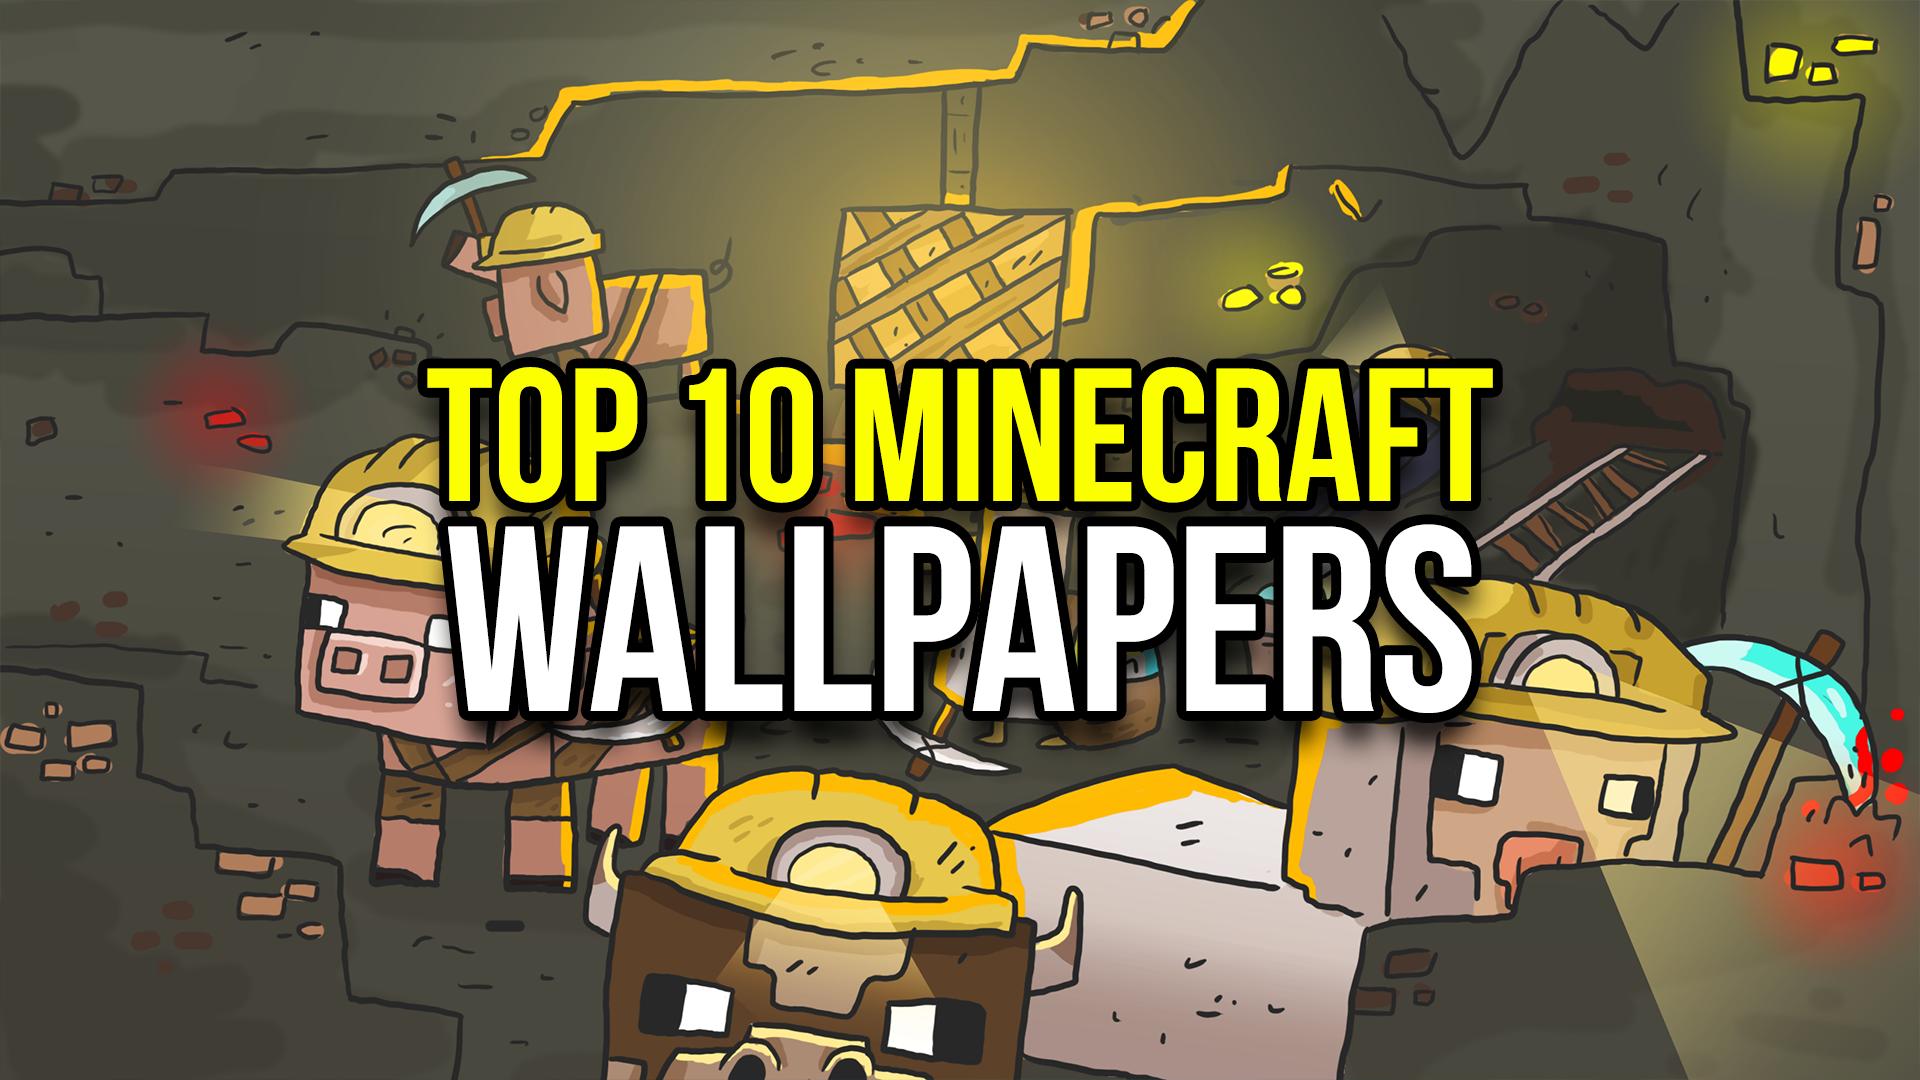 top 10 minecraft wallpapers - minecraftrocket